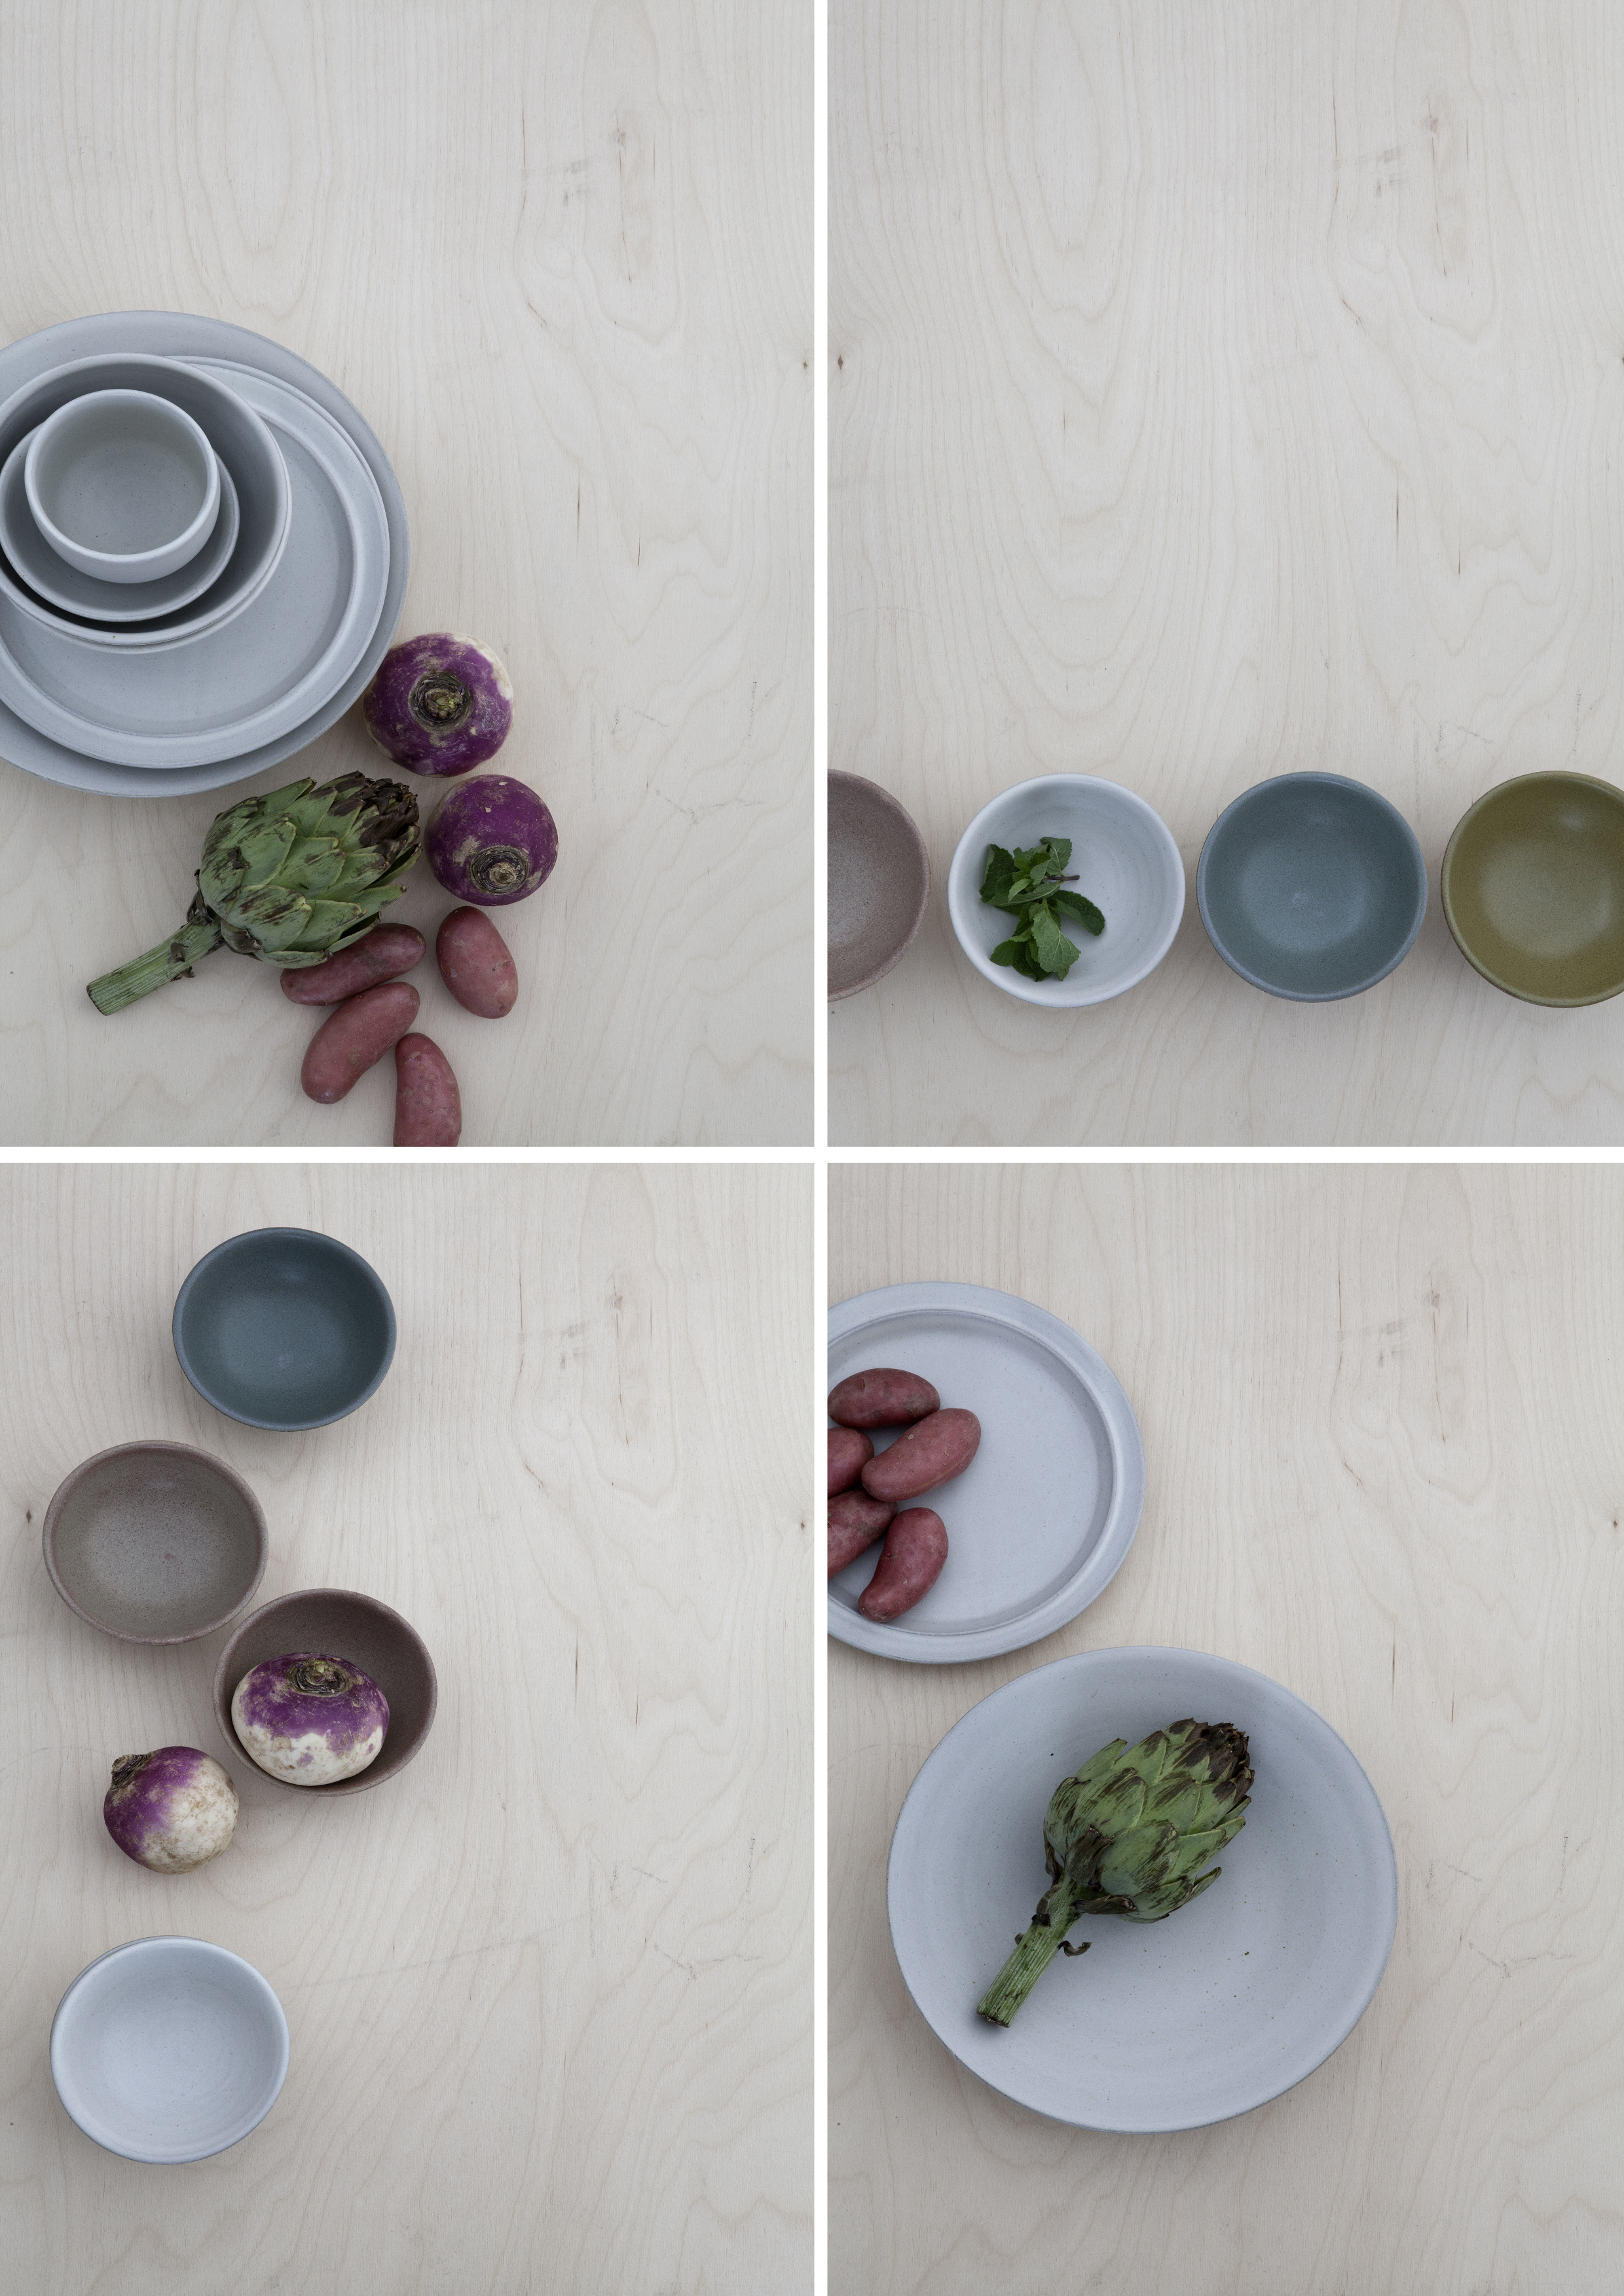 Edblad keramikk